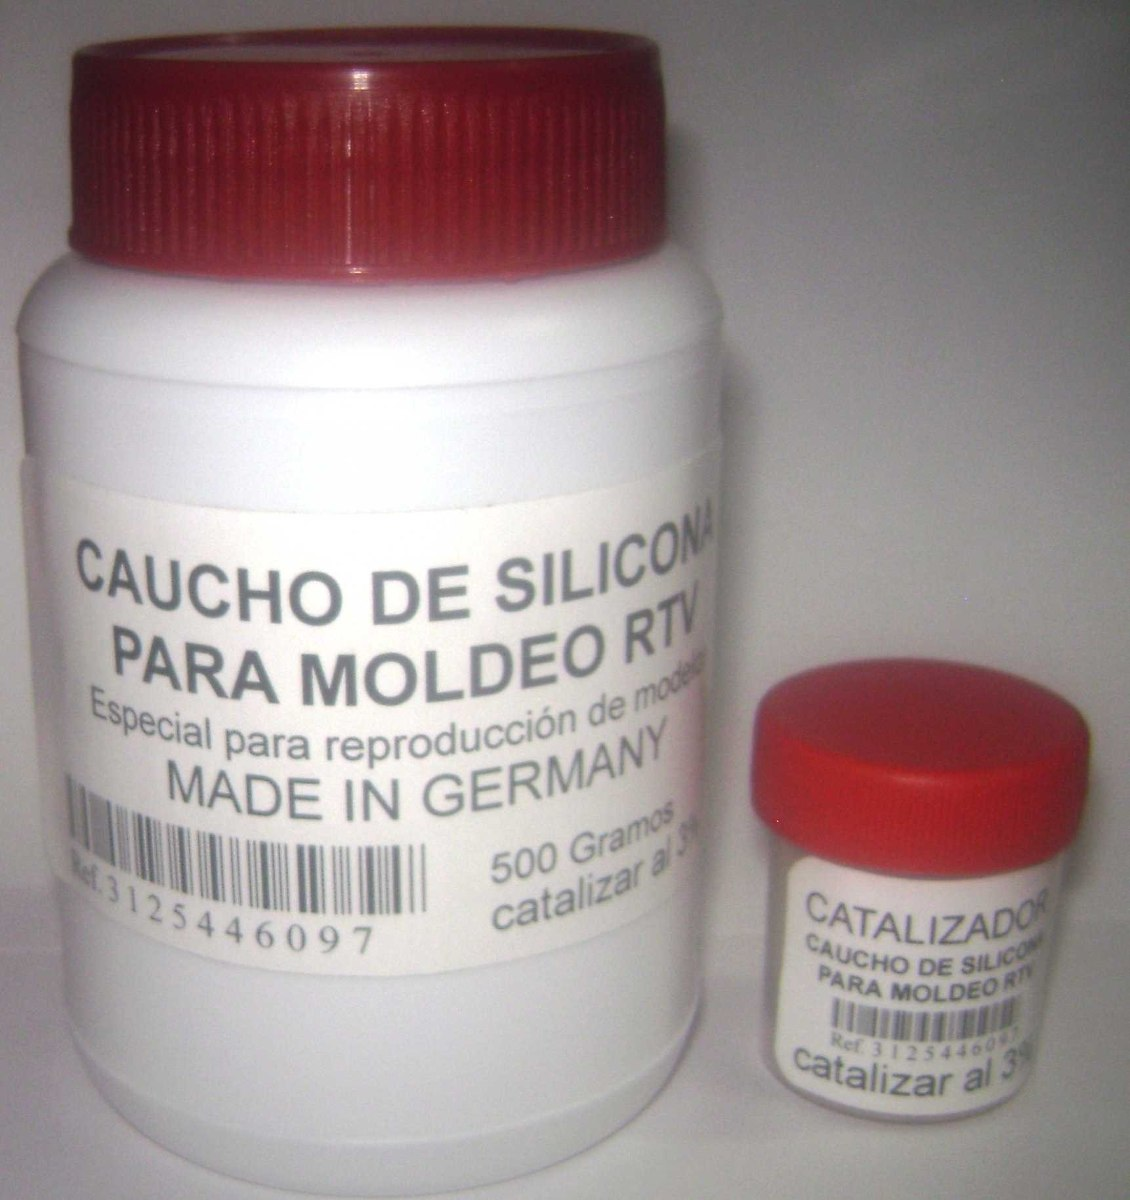 Caucho de silicona para moldes y reproducci n de modelos for Caucho de silicona